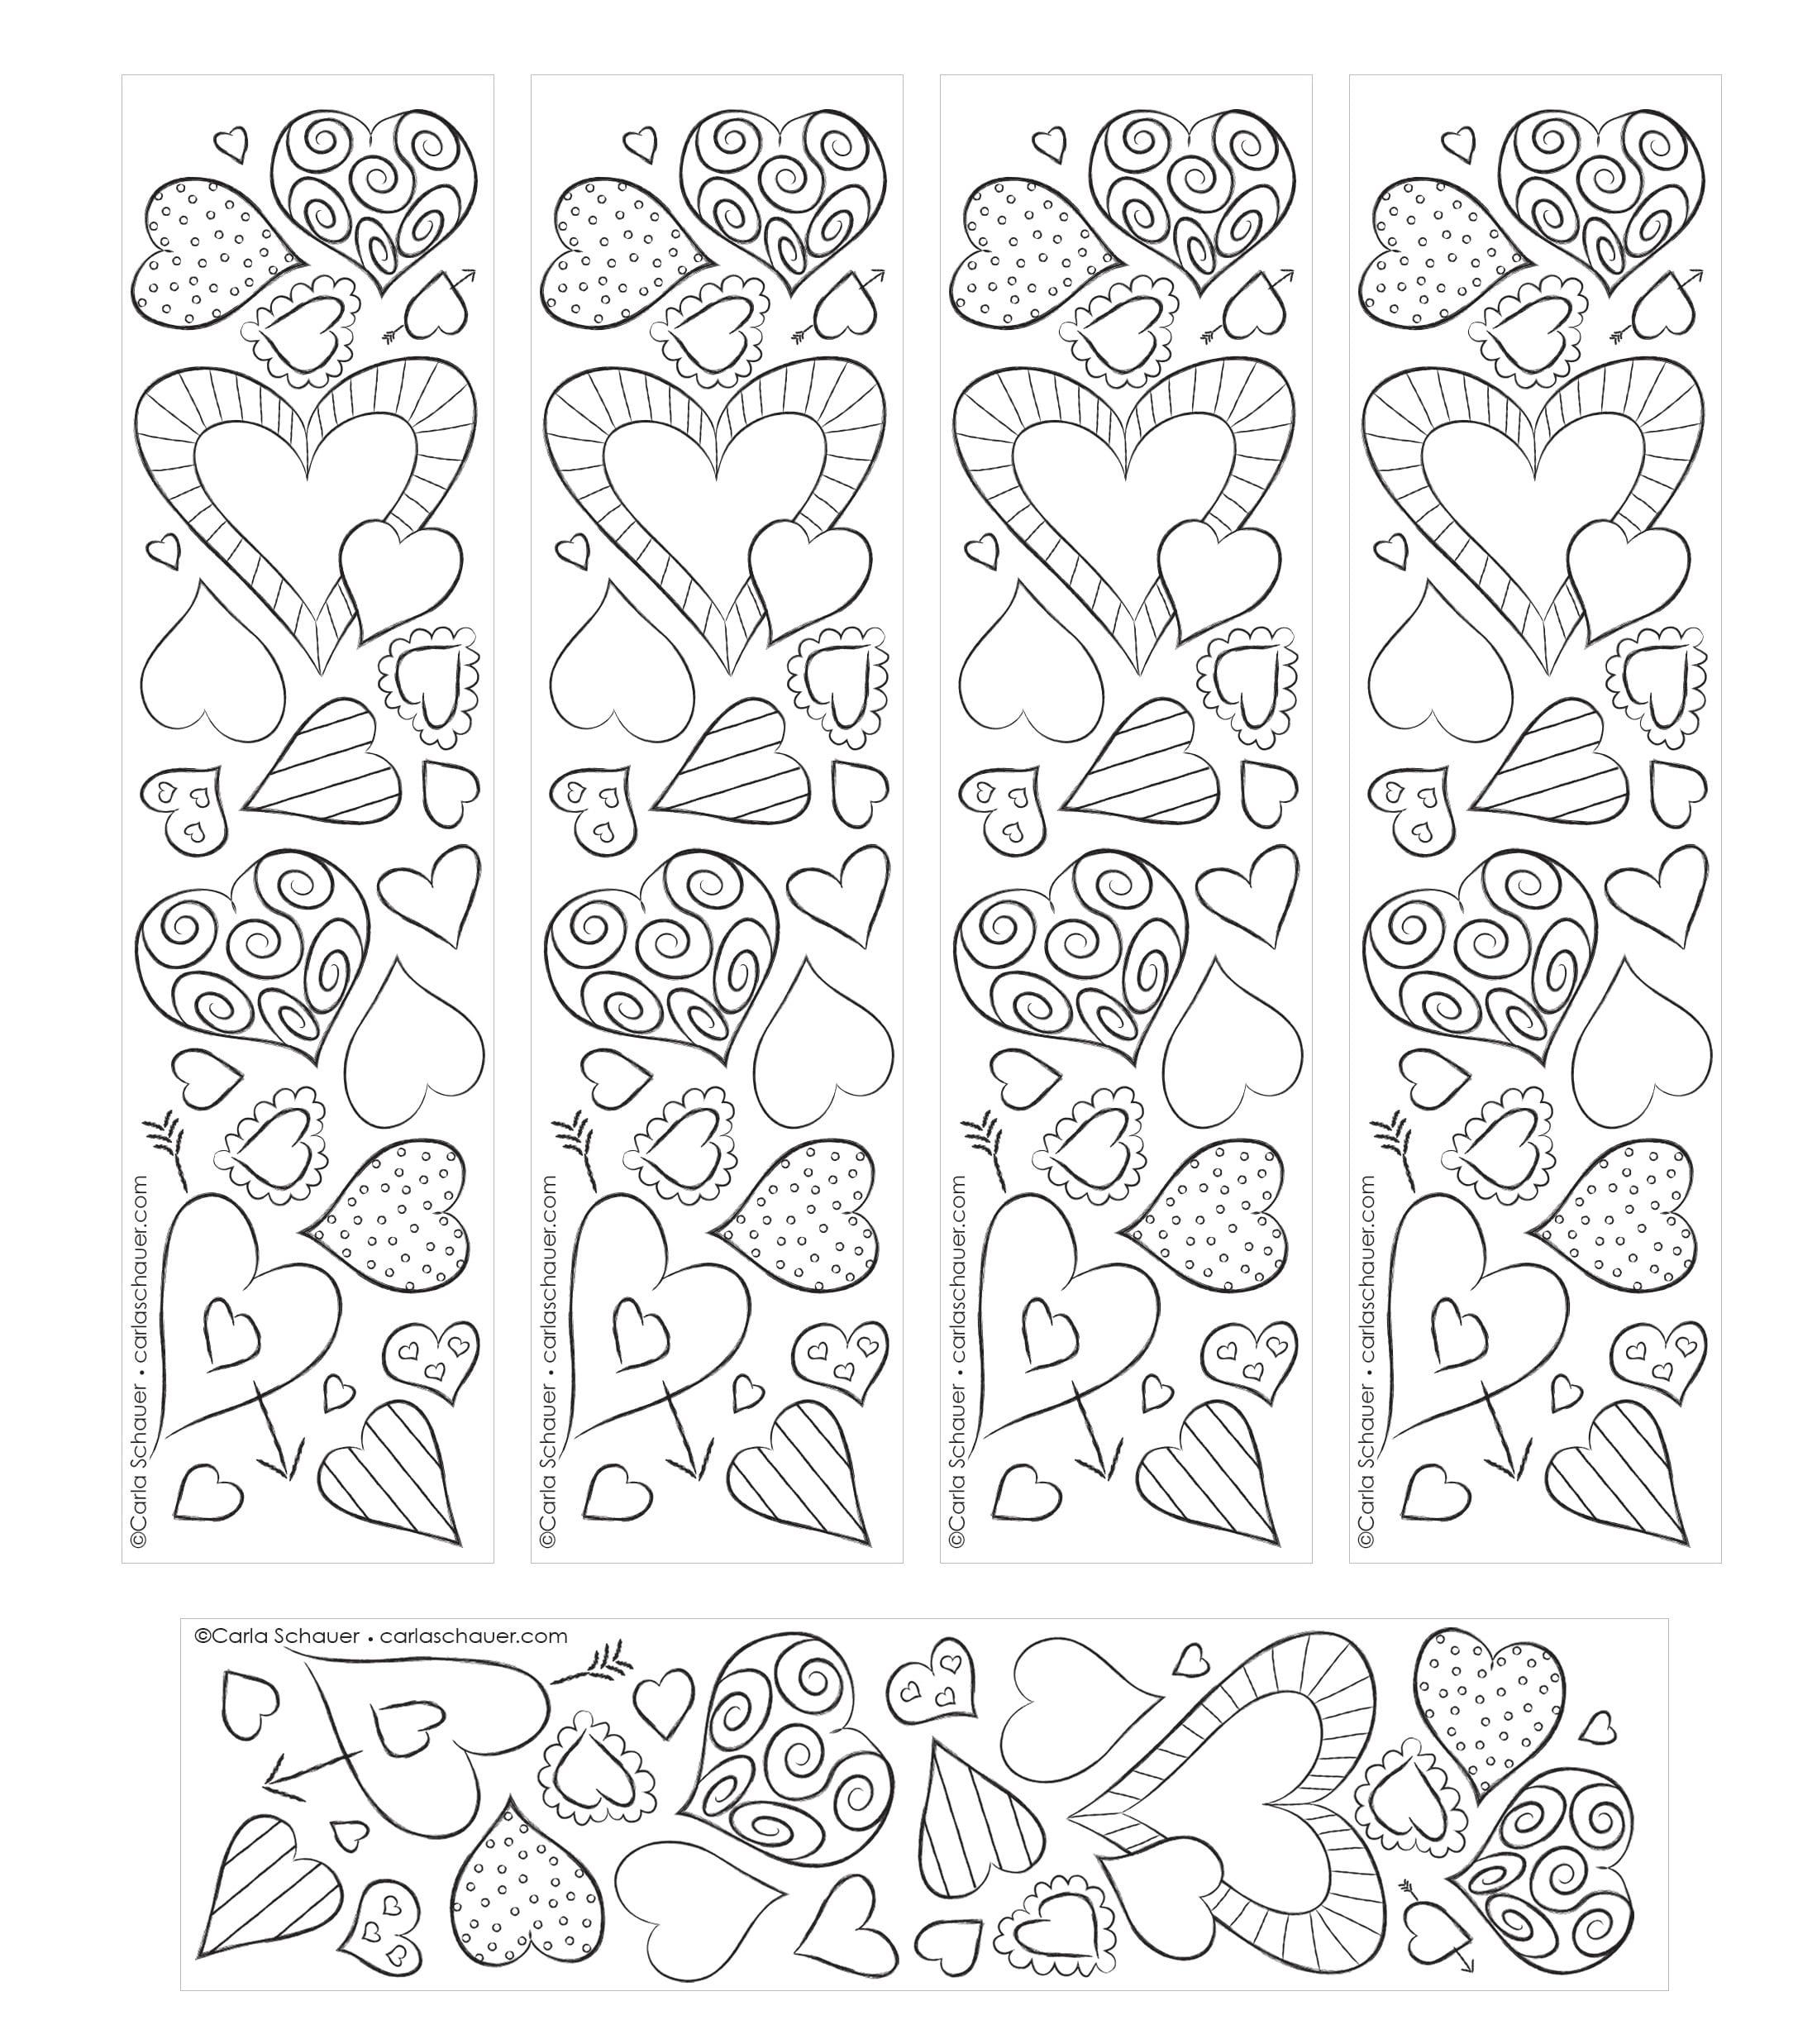 Заготовки черно-белая для печати закладки